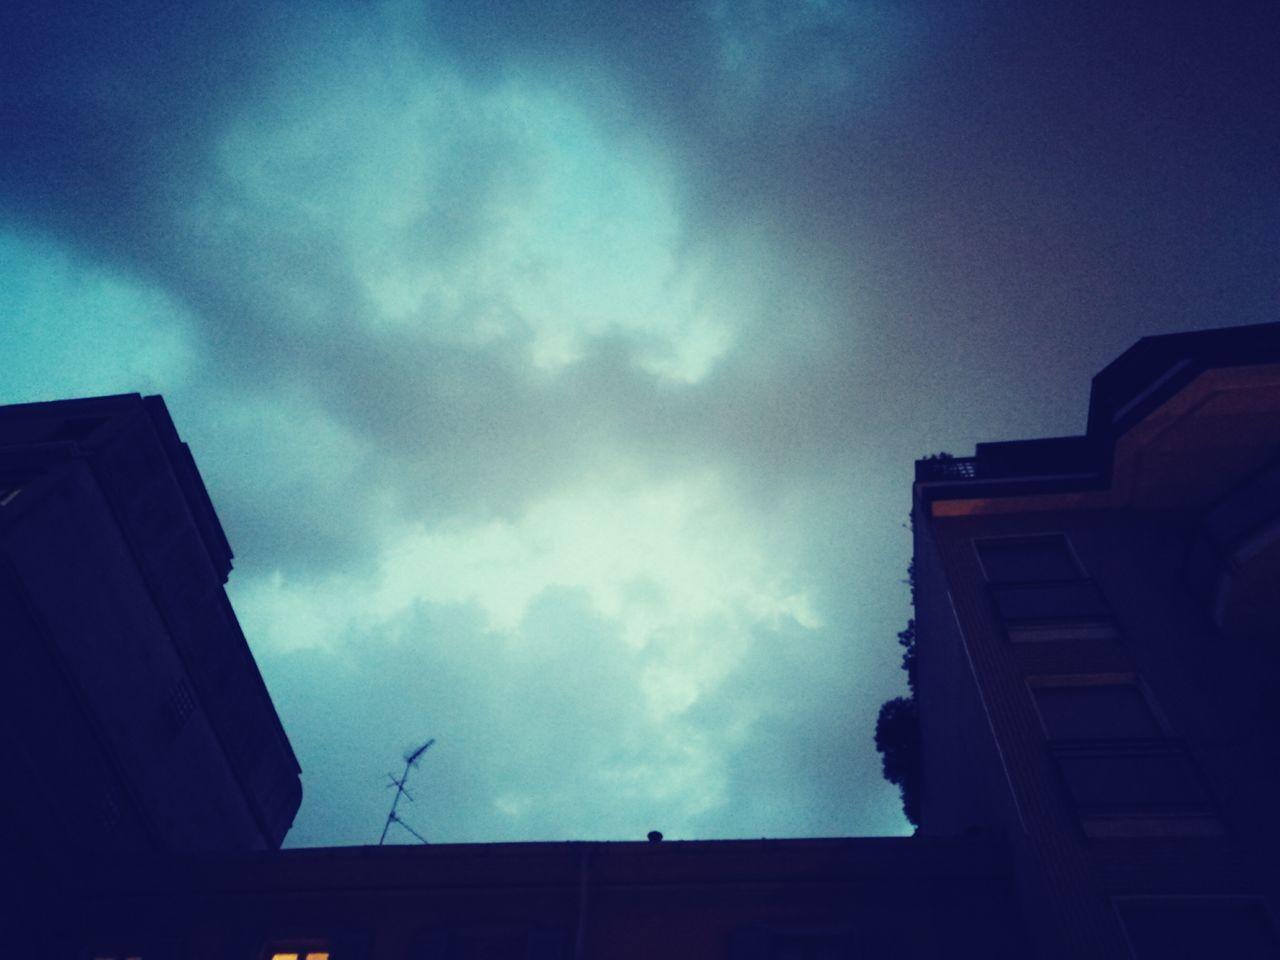 Cloud - Sky No People Low Angle View Outdoors Rain's Coming